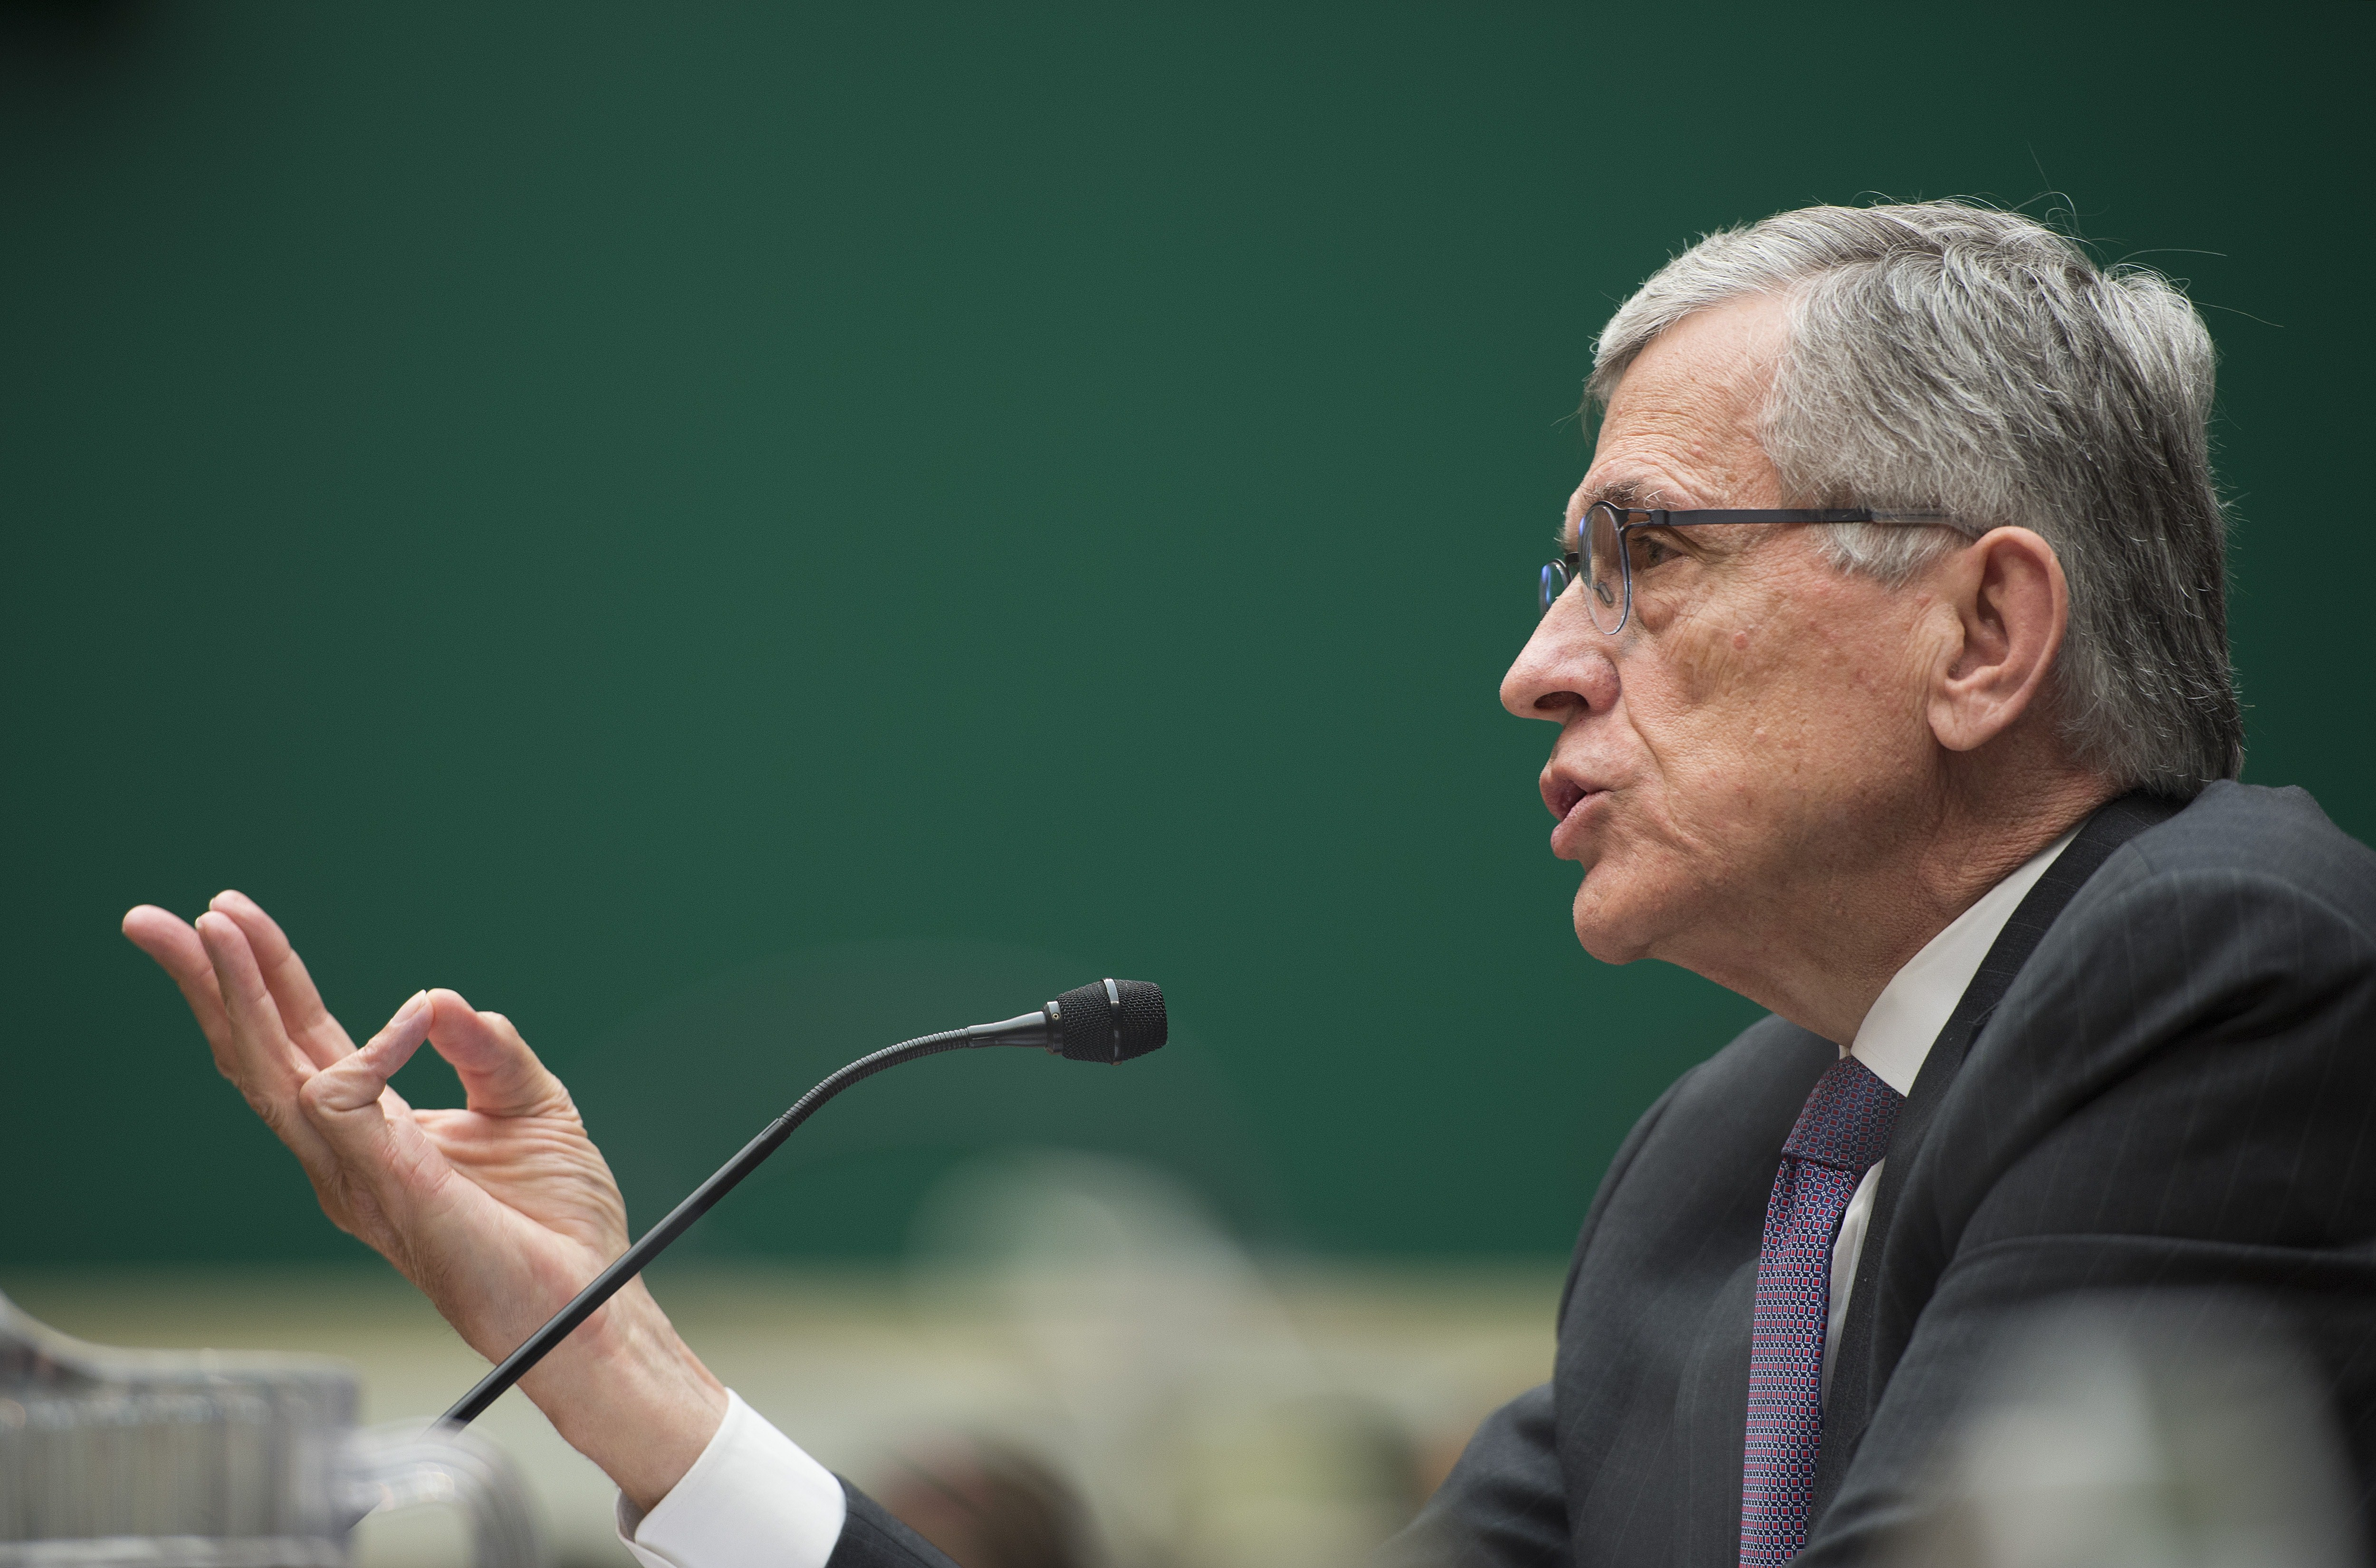 FCC Chairman Tom Wheeler has three options for the future of internet regulation.